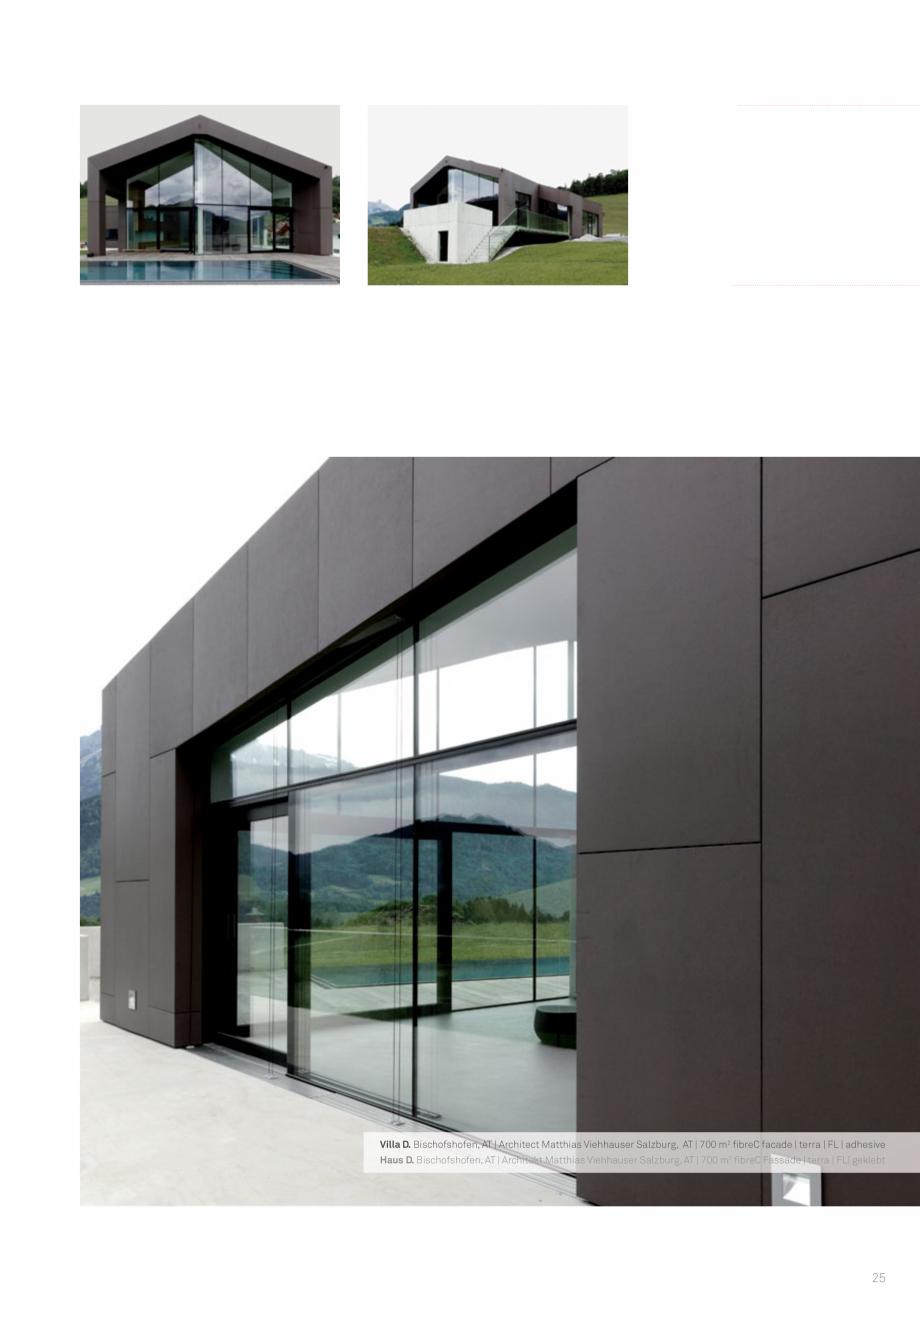 Pagina 27 - Panouri din beton aparent RIEDER Concrete Skin Lucrari, proiecte Engleza dercut anchors ...